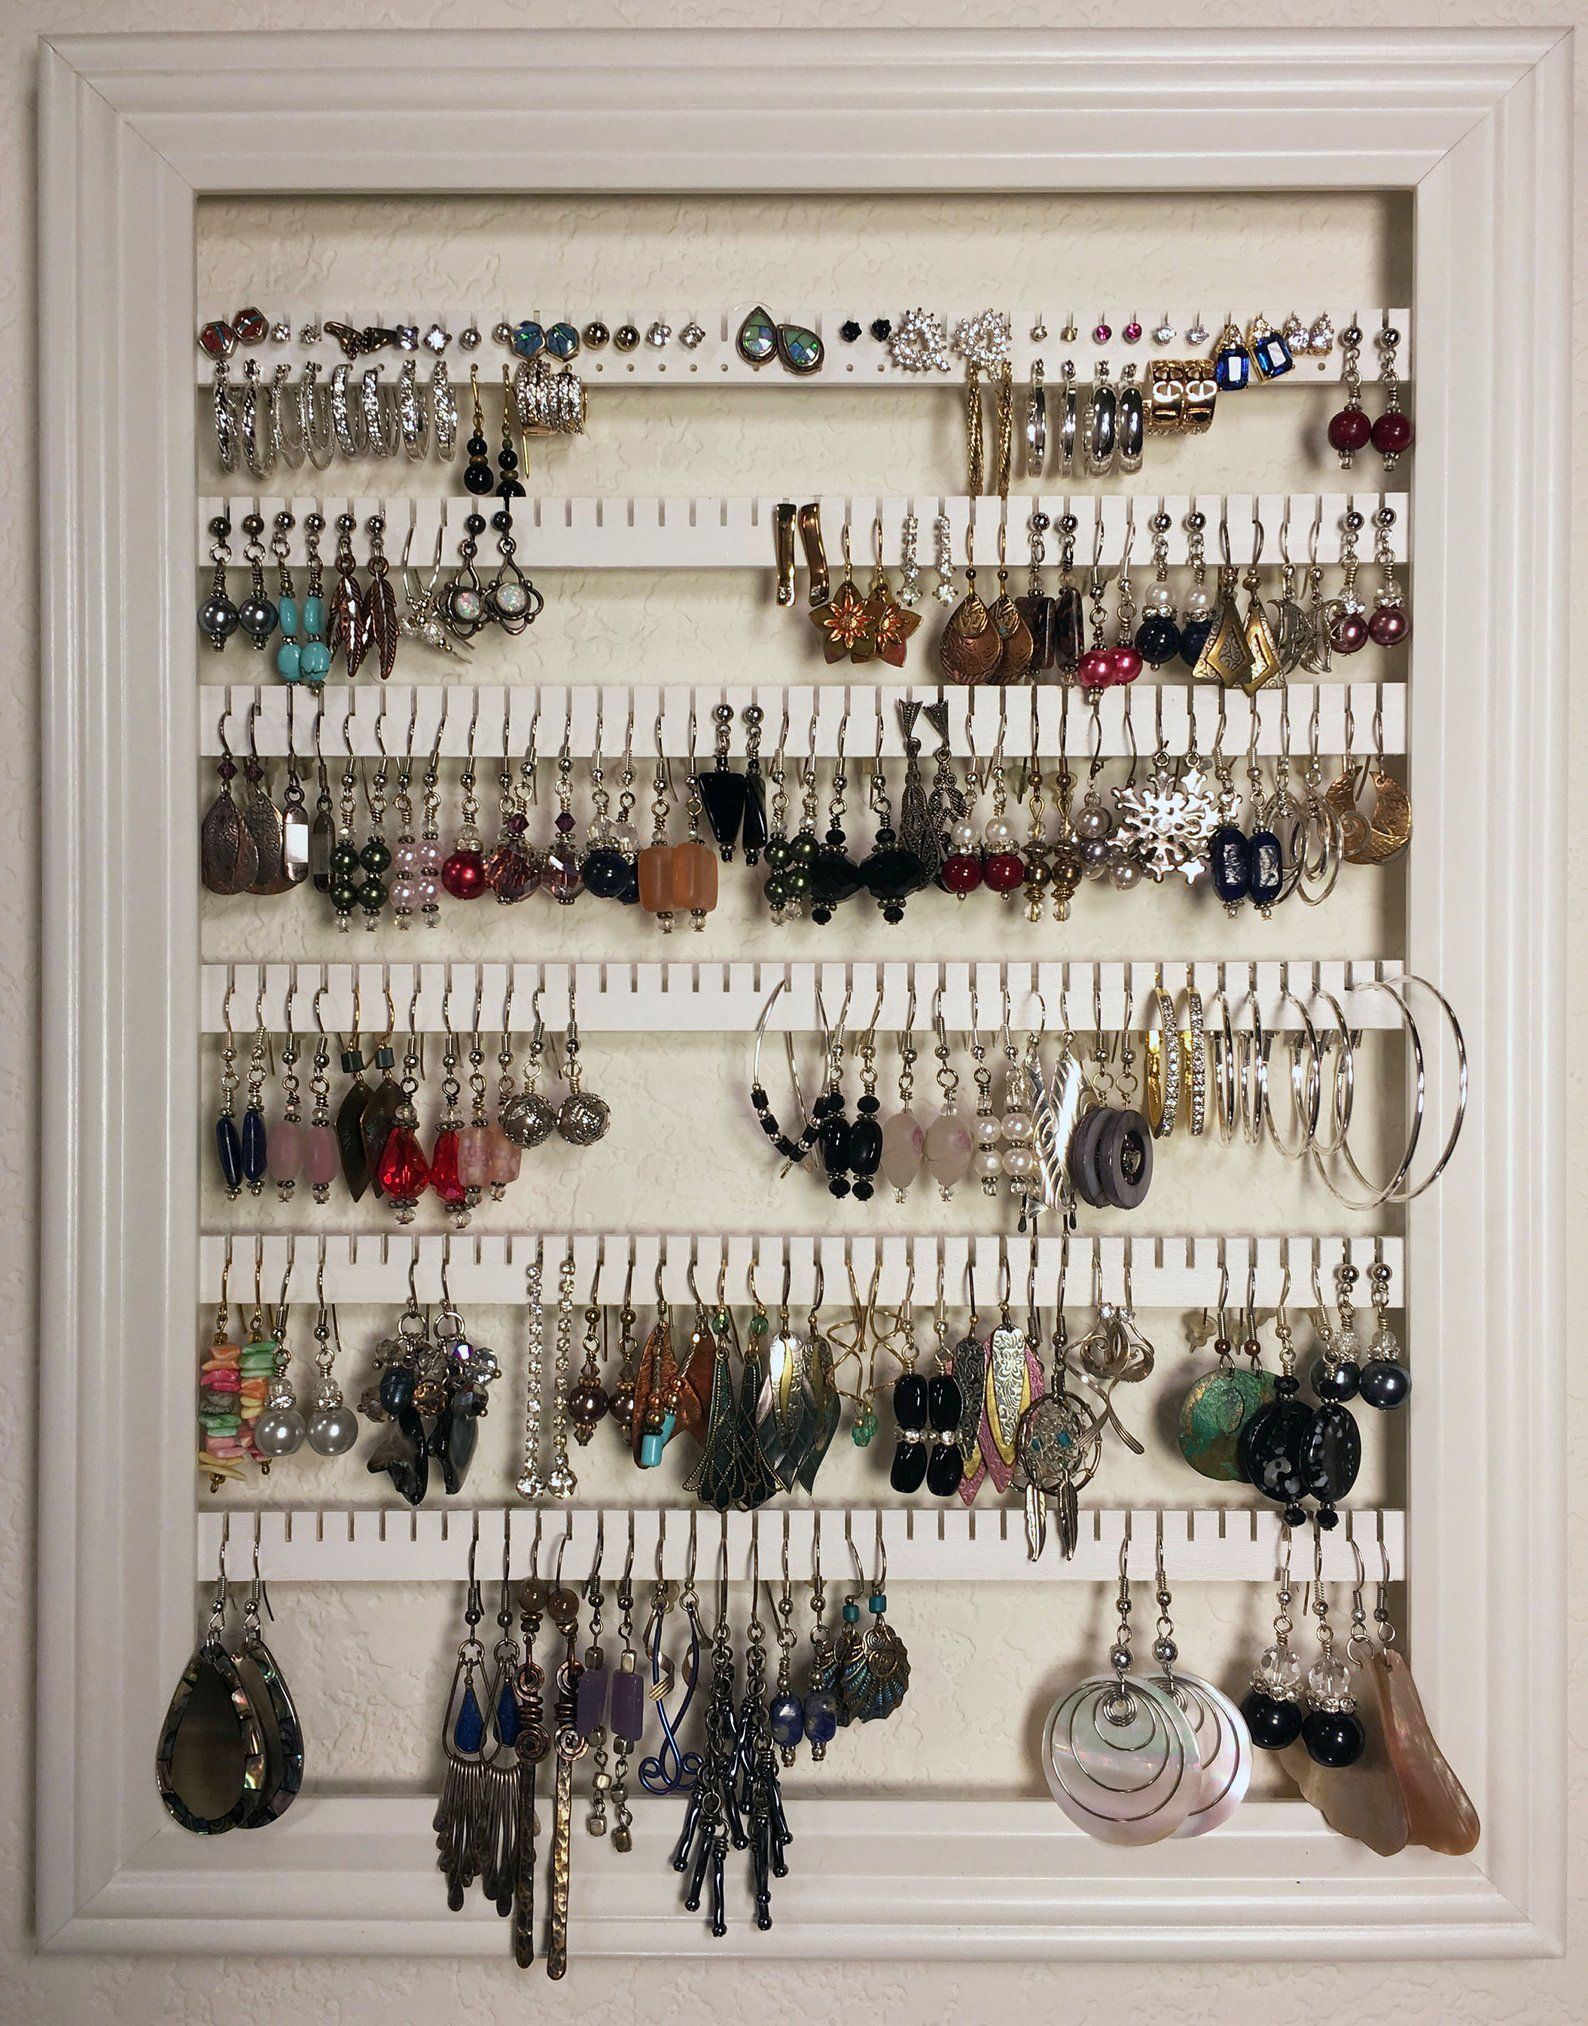 jewelry box earring stand jewelry storage jewelry rack earring rack earring jewelry box earring display wood earrings rack jewelry